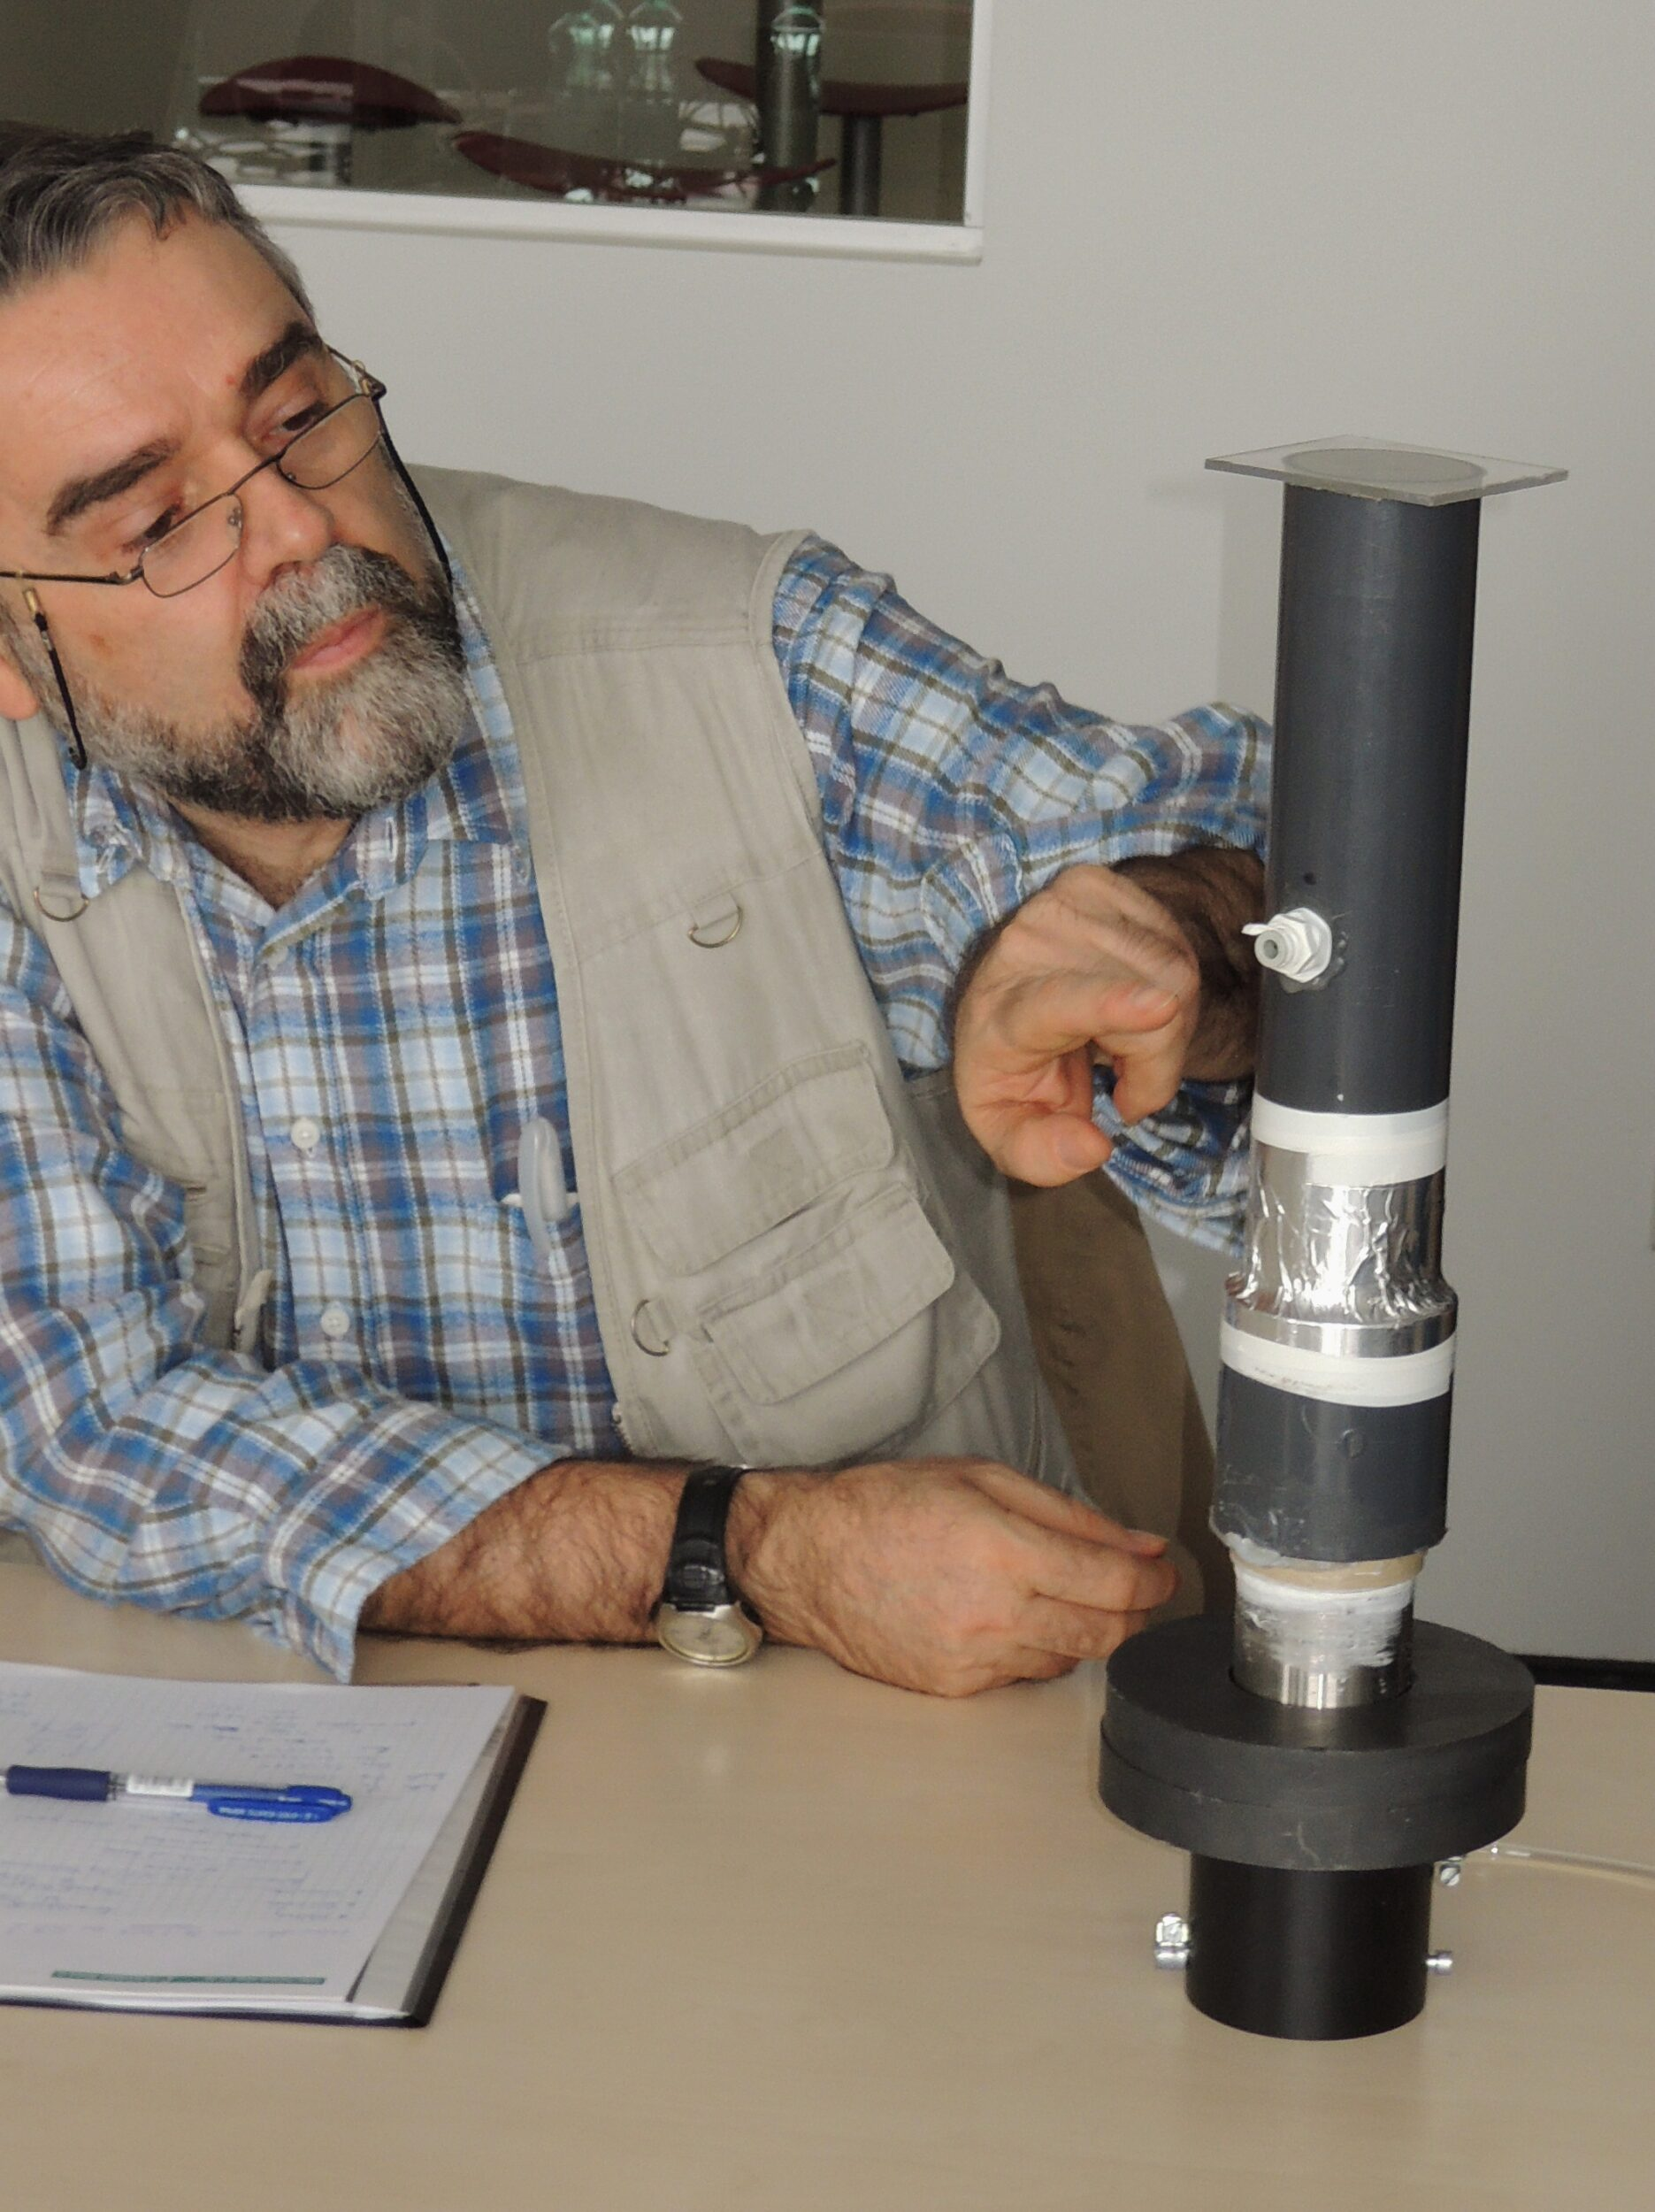 Dr. Johann Laimer, Associate Professor at Institut fur Allgemeine Physik at Vienna University of Technology